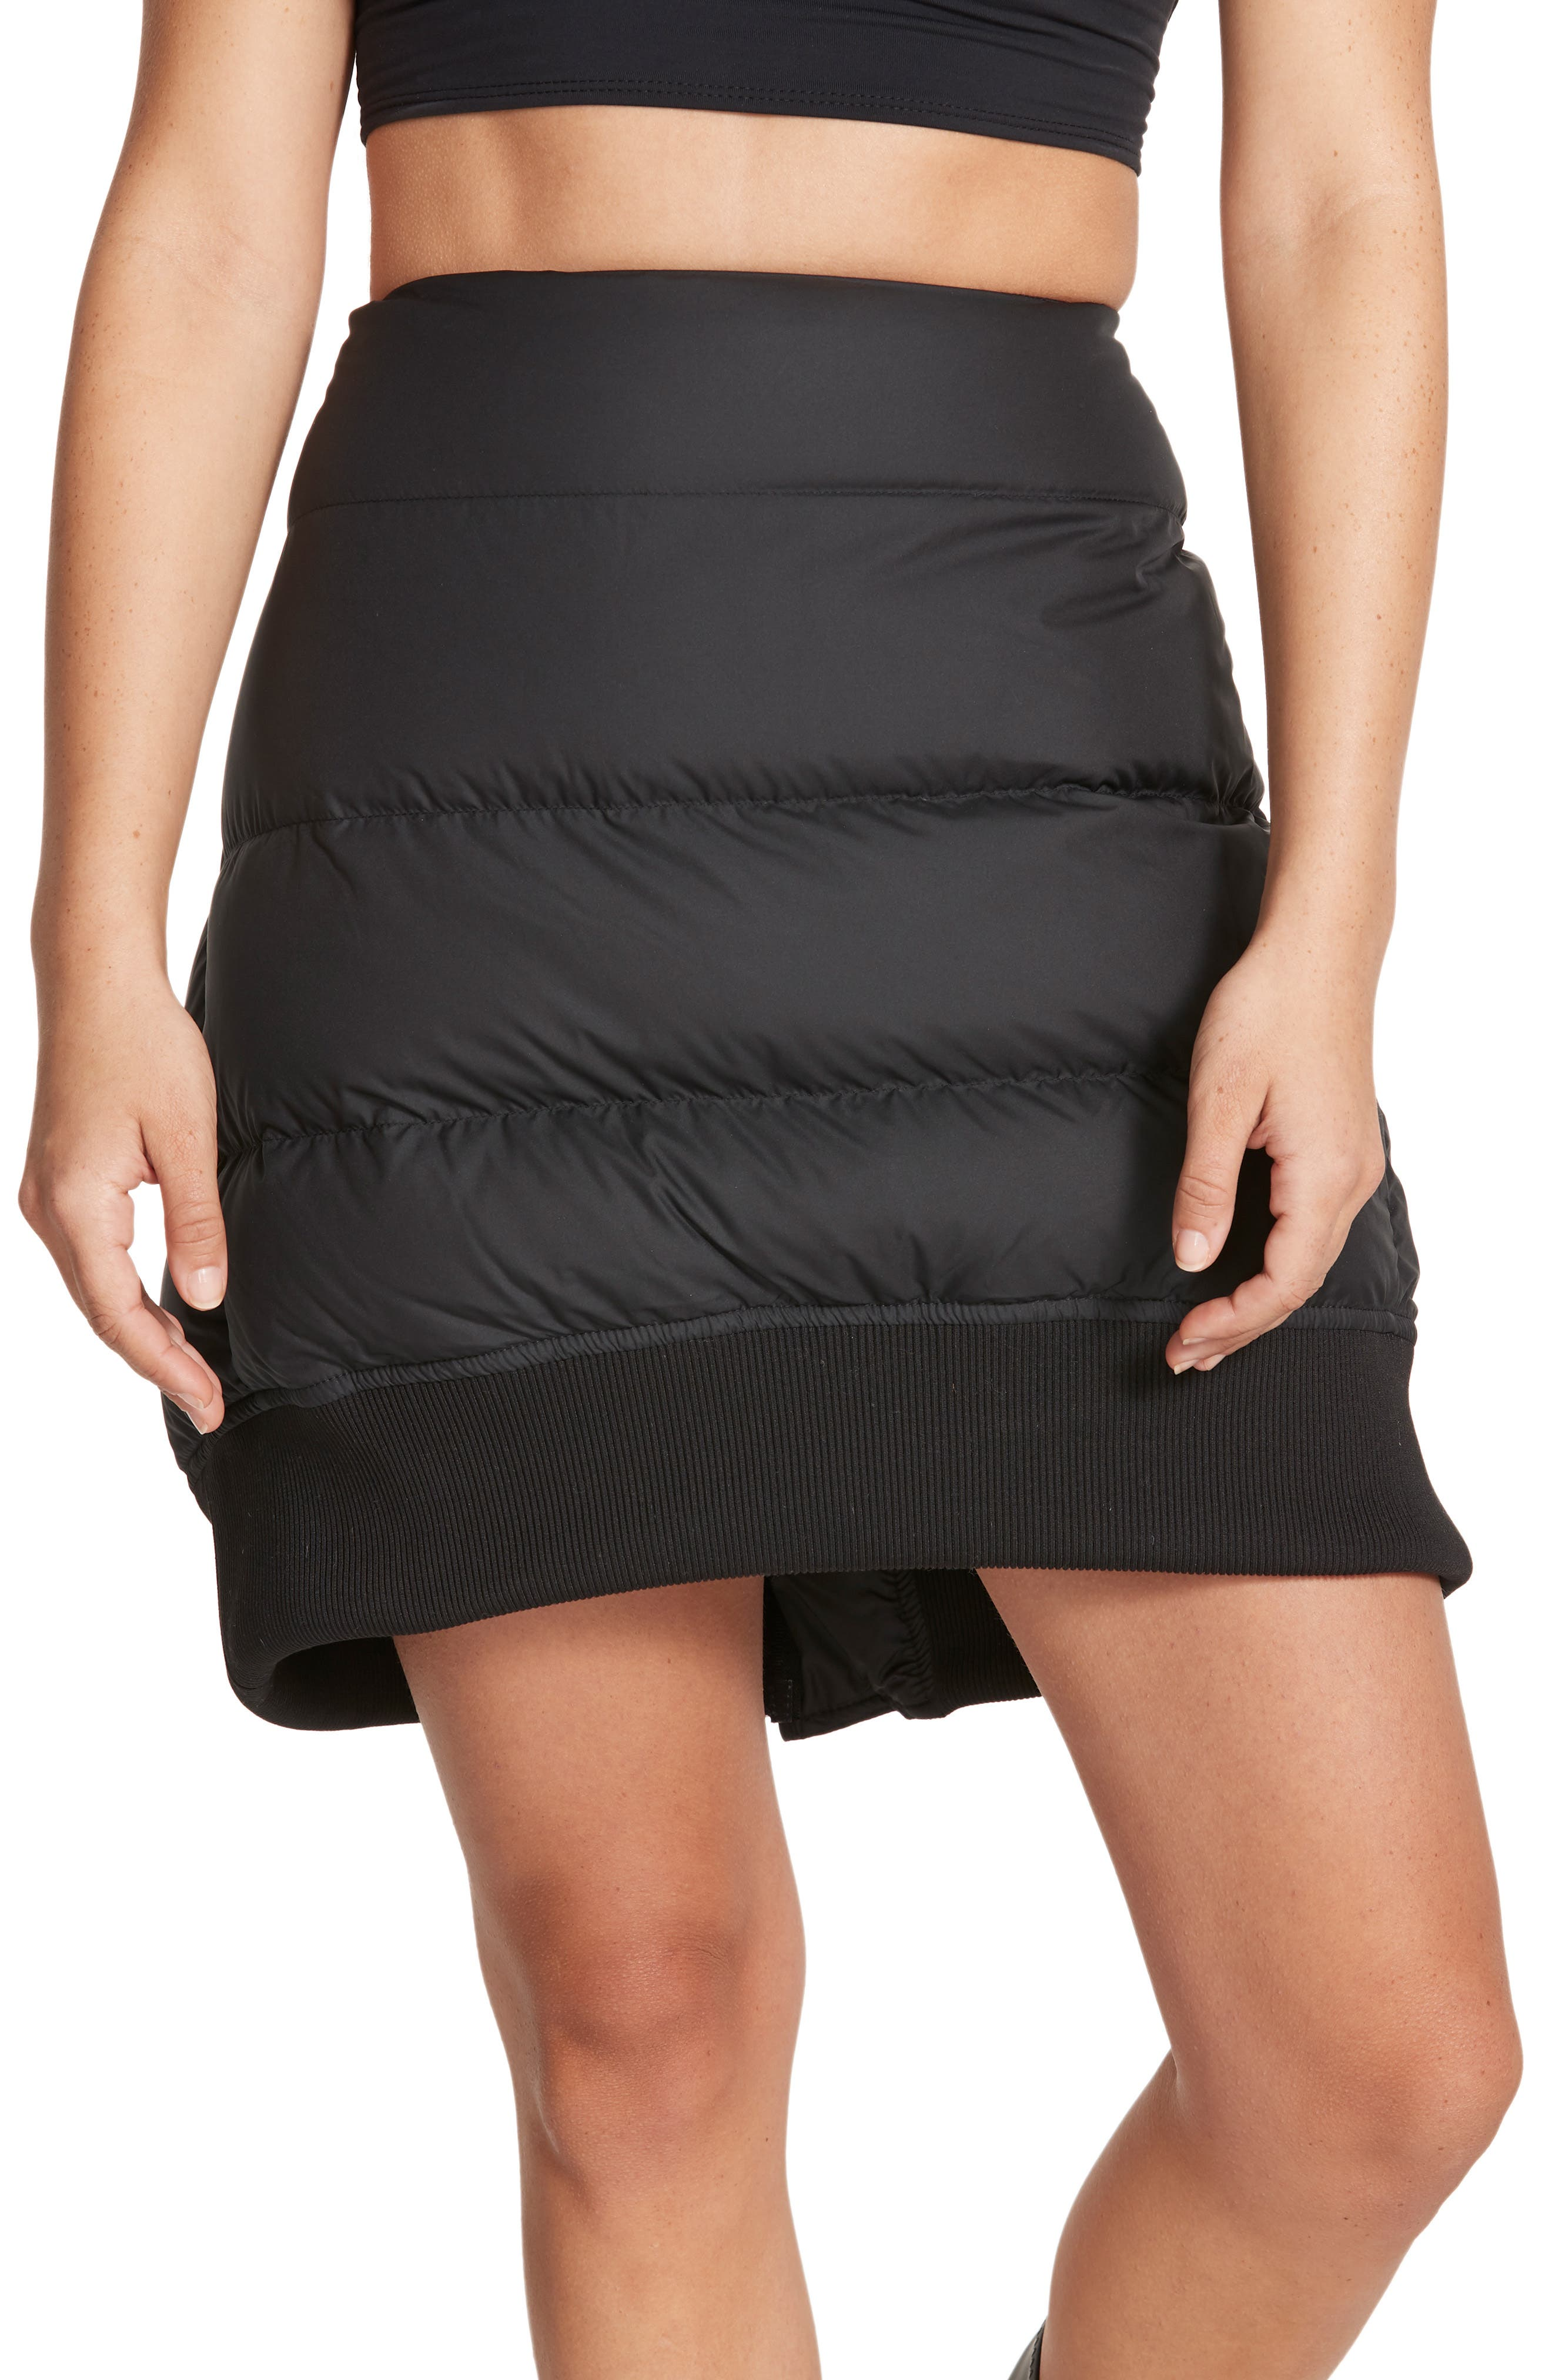 x Dianne Garcia Puffy Skirt, Main, color, 001